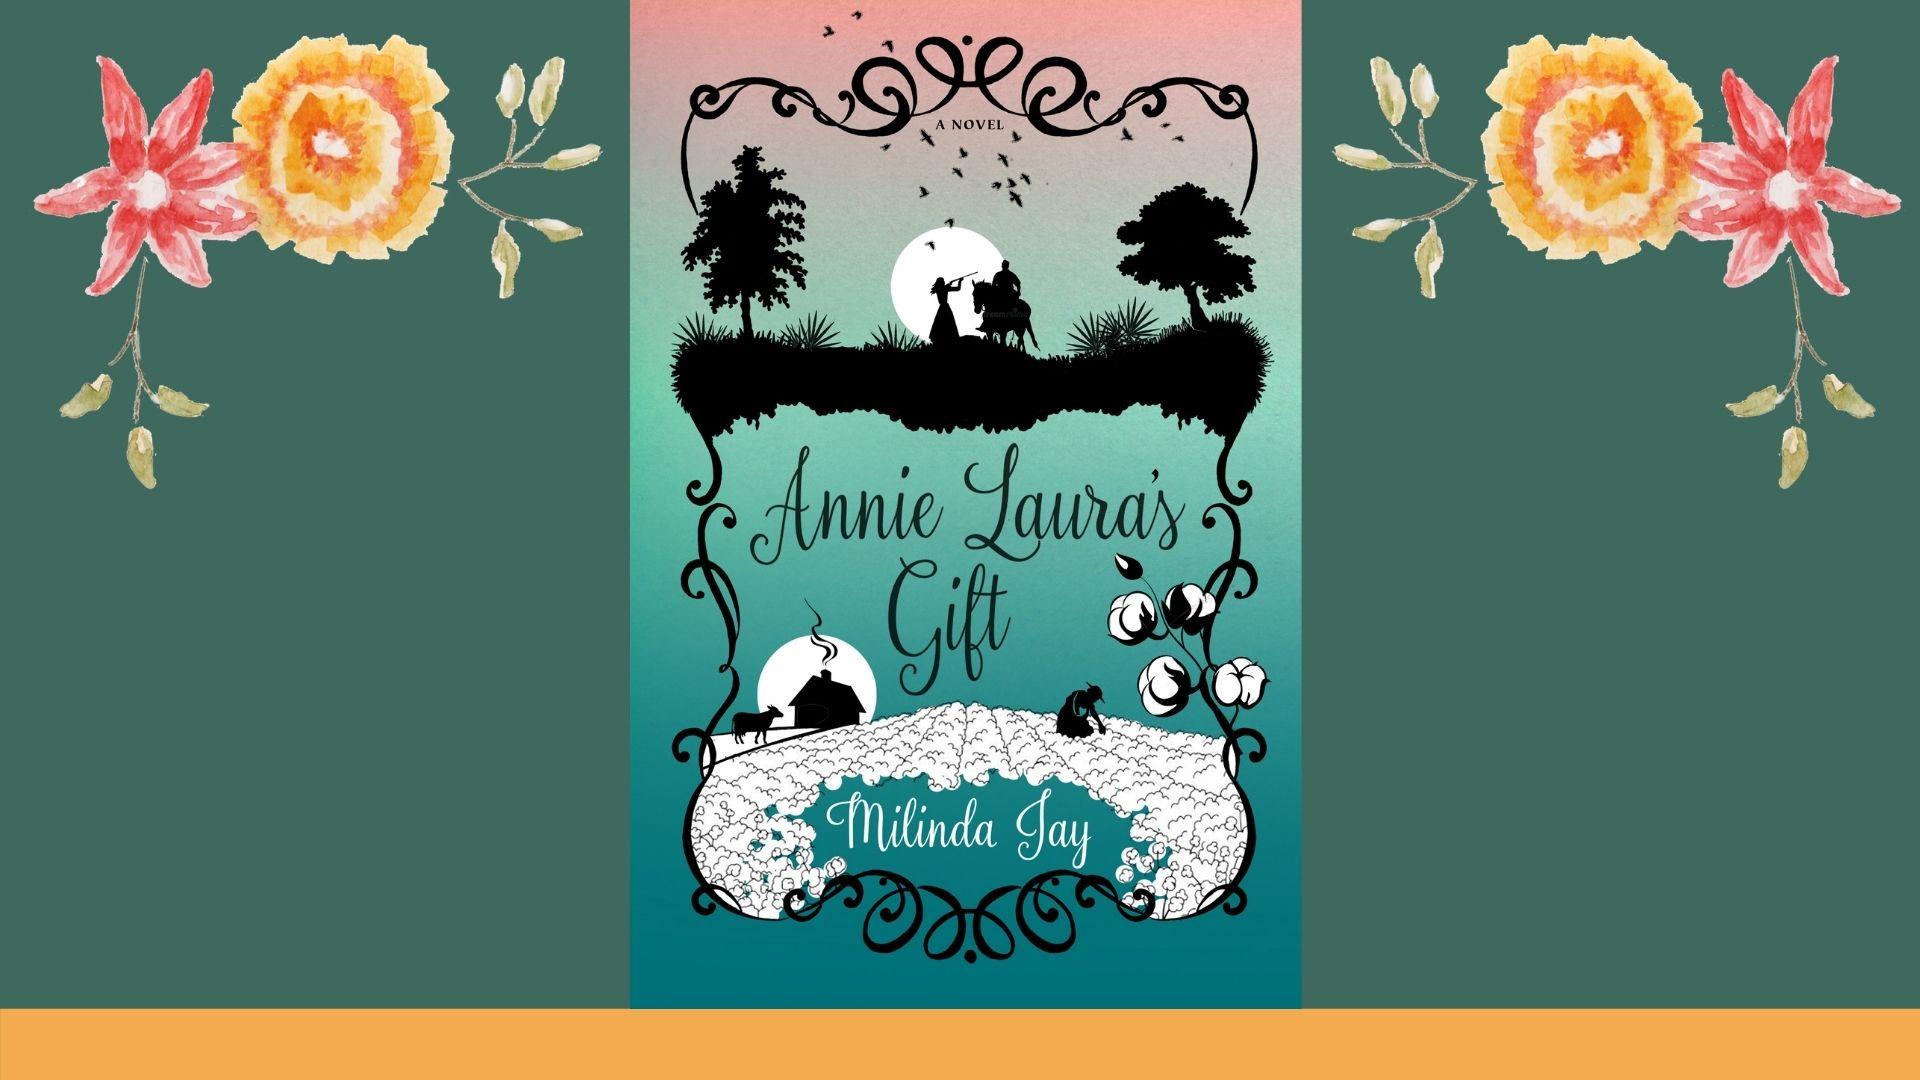 Book Club with Author Milinda Jay